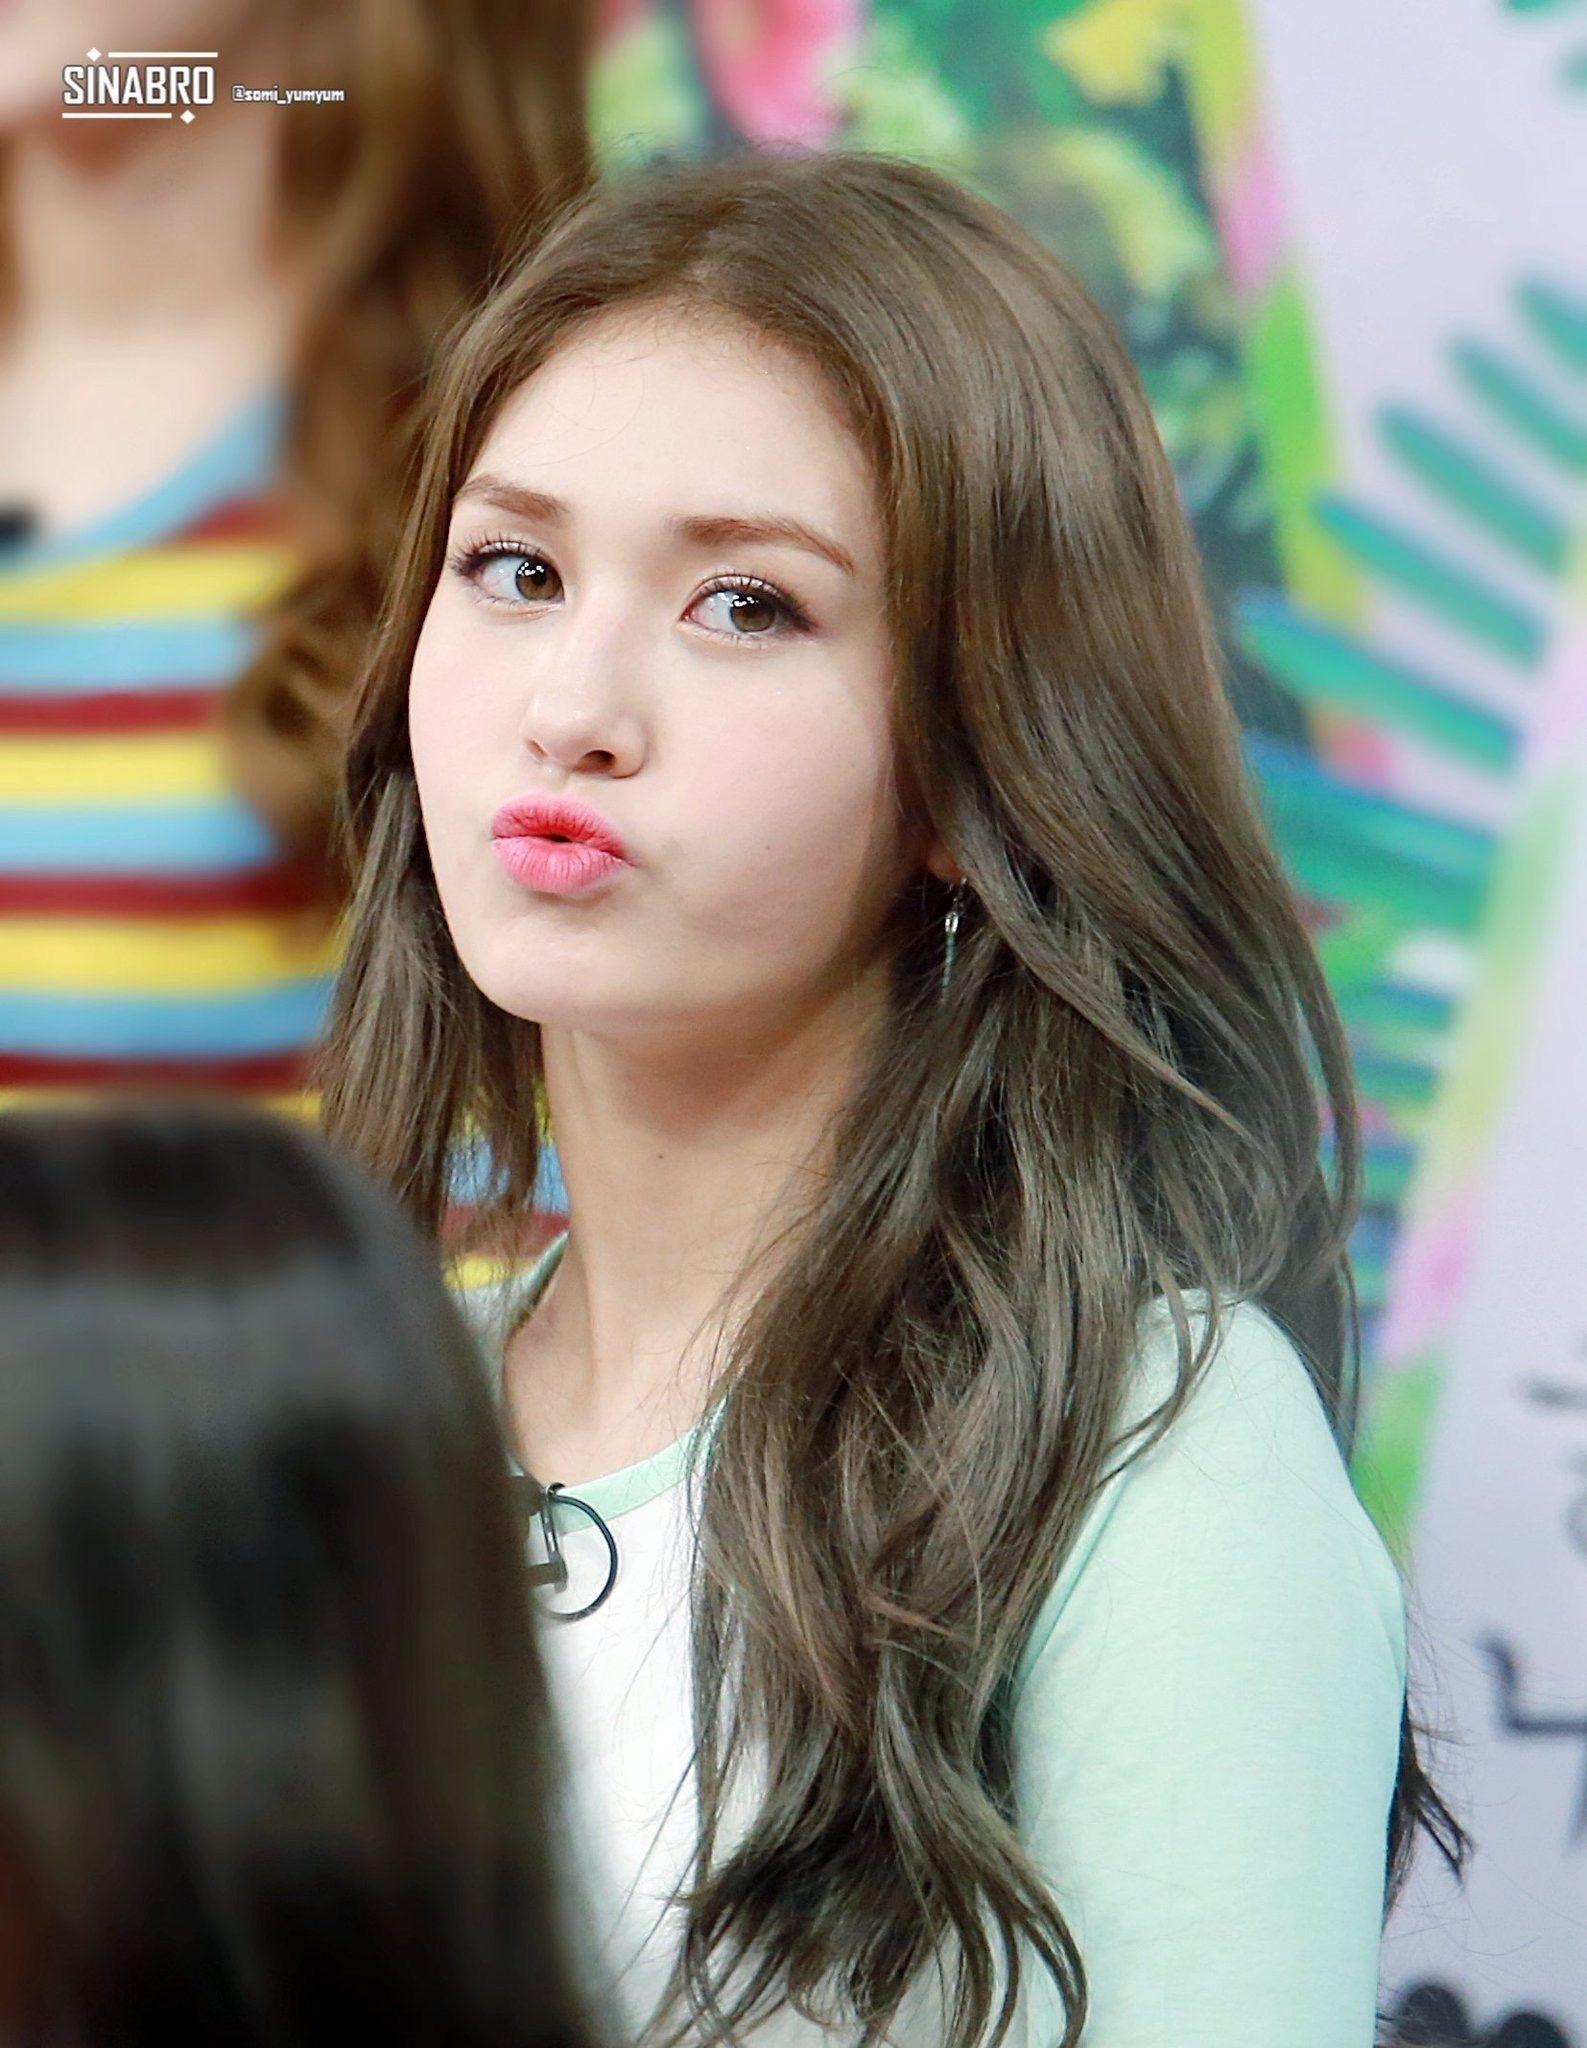 Jeon Somi   Somi   Pinterest   Kpop And Korean with Jeon Somi Hair Color